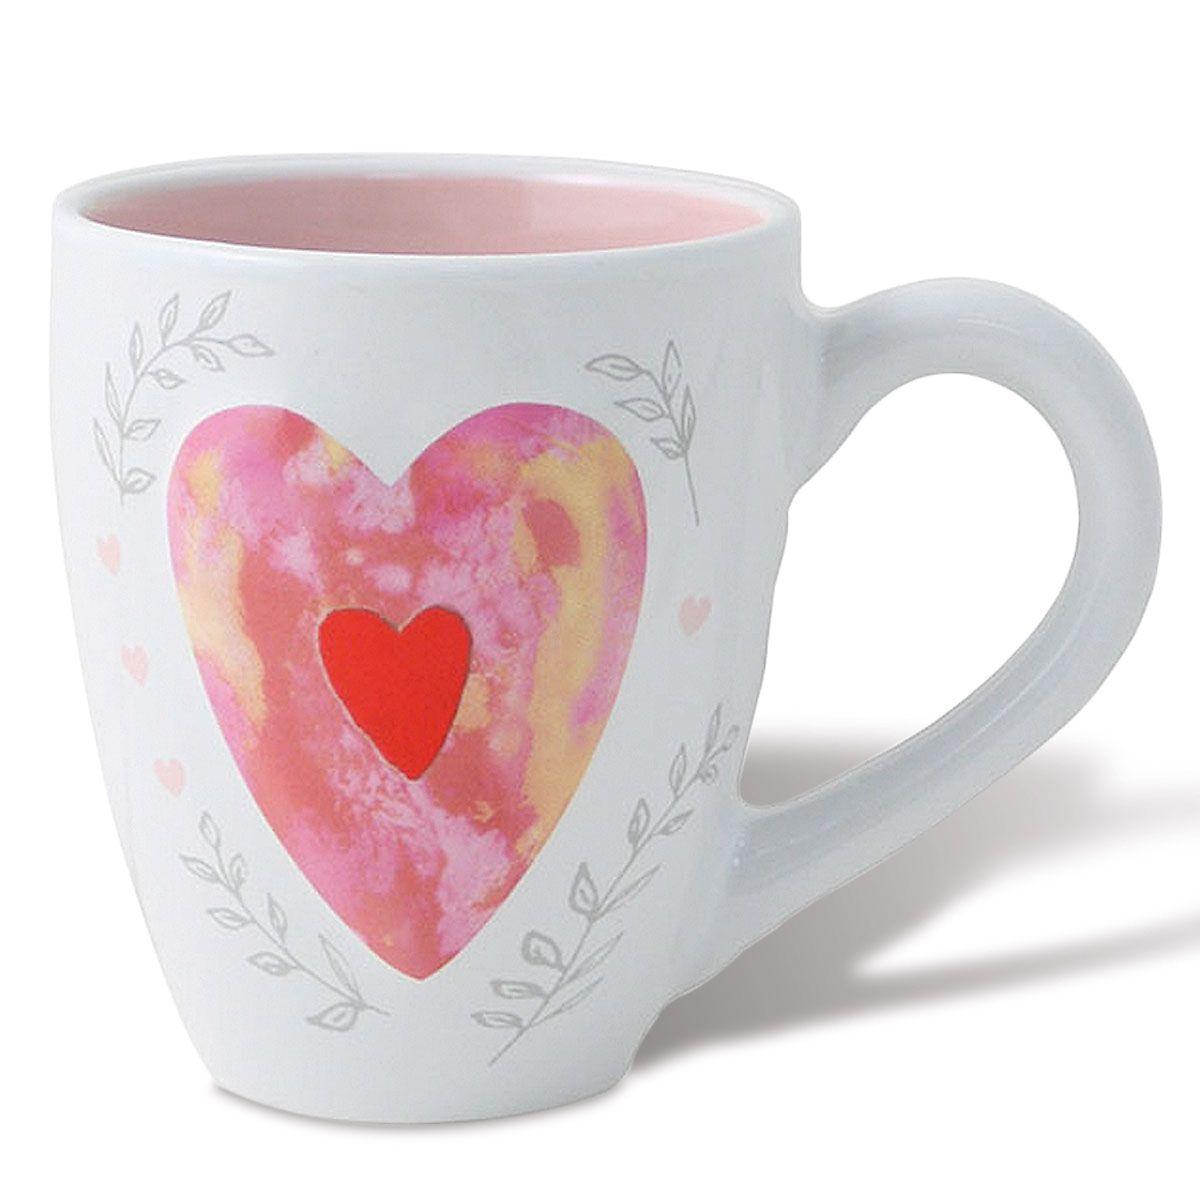 Raised Heart Mug